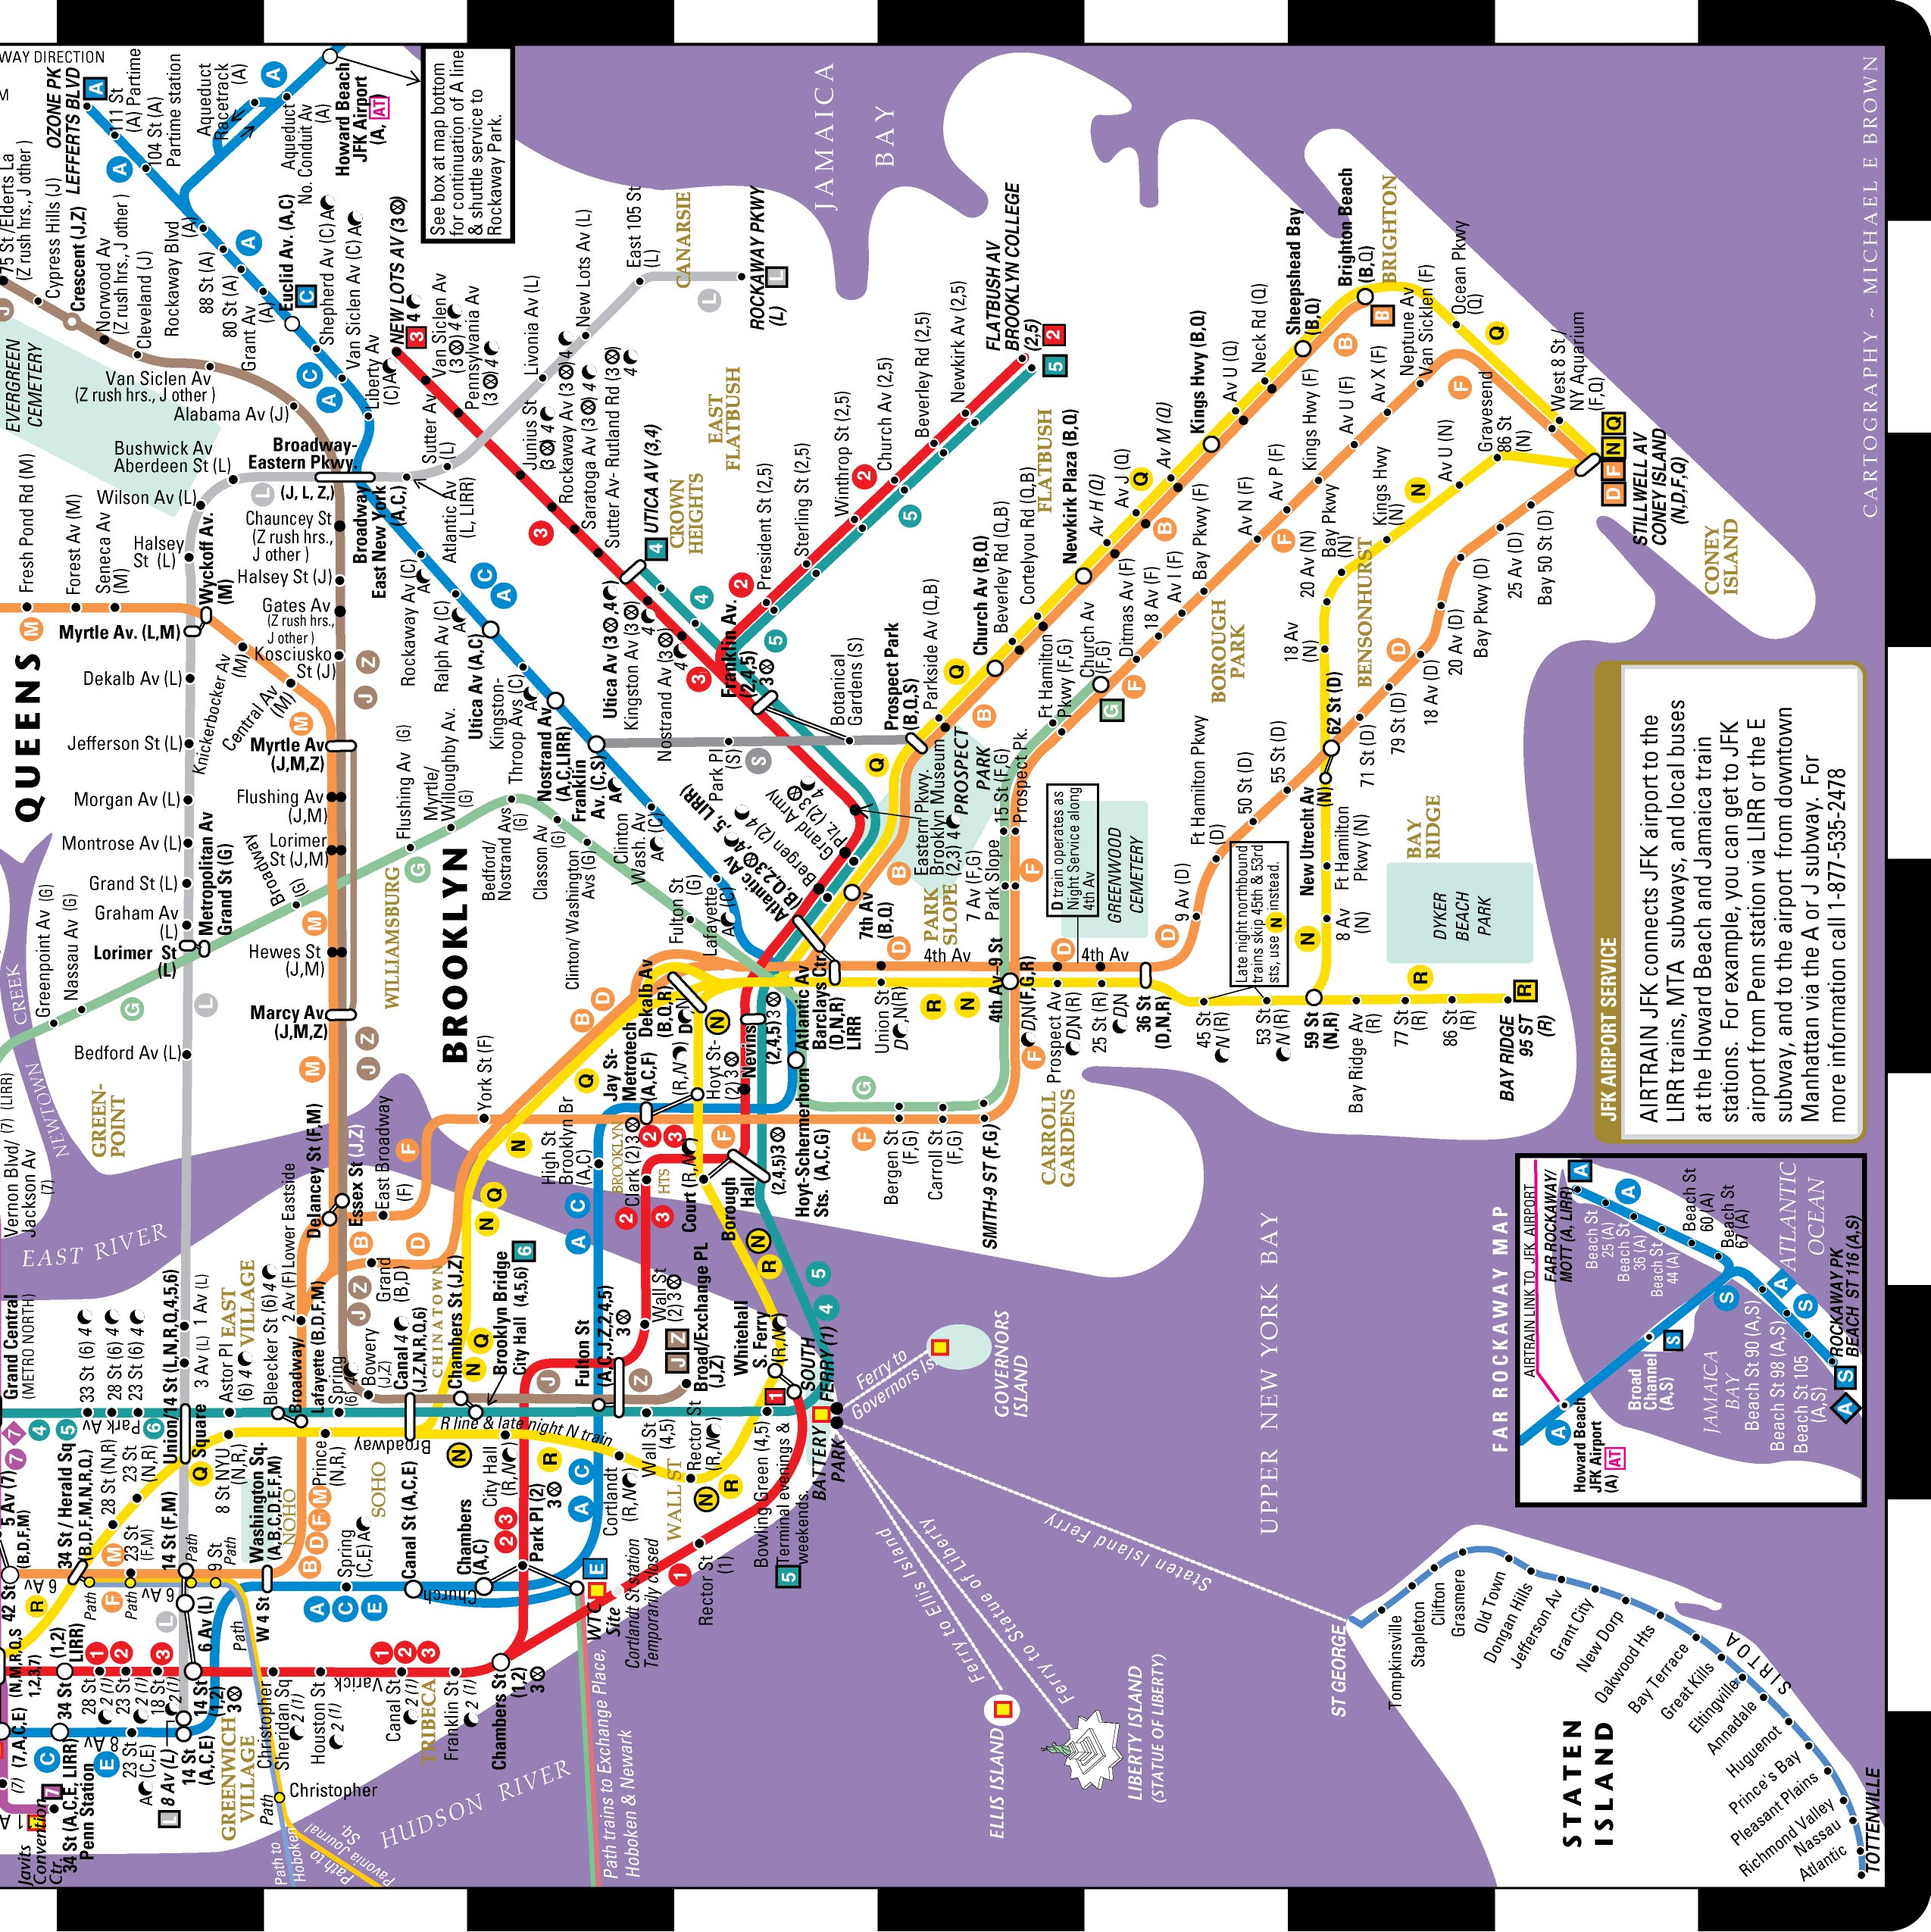 Nyc Subway Map Howard Beach.Streetwise Transitwise New York City Subway Map Manhattan Subway